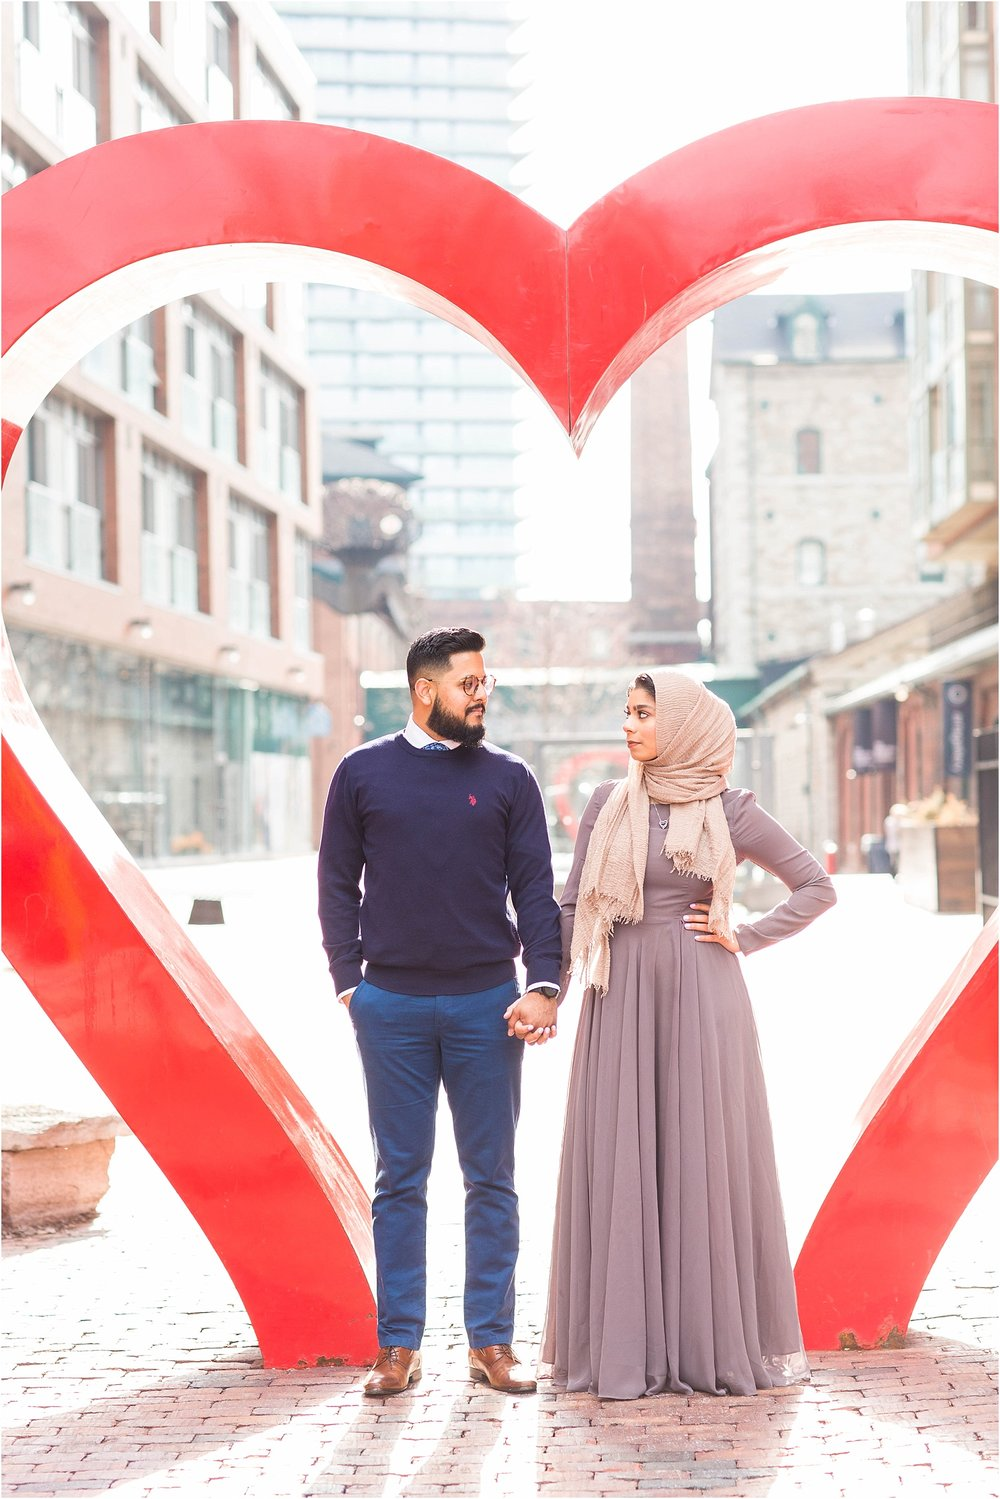 Polson-Pier-Distillery-District-Engagement-Session-Toronto-Mississauga-Brampton-Scarborough-GTA-Pakistani-Indian-Wedding-Engagement-Photographer-Photography_0052.jpg